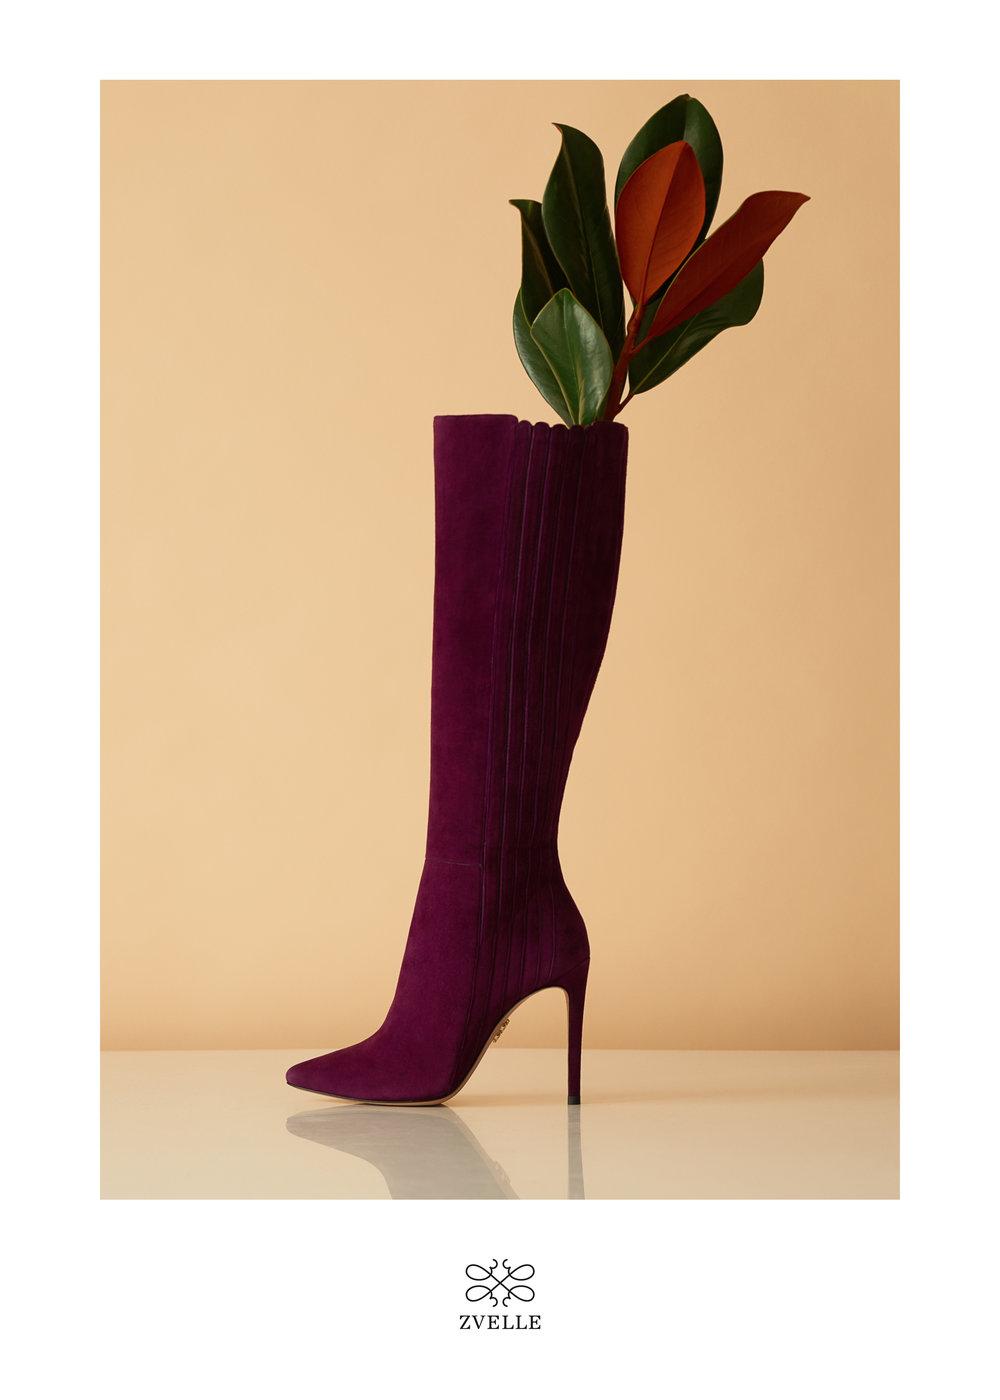 Zvelle Shoes Campaign